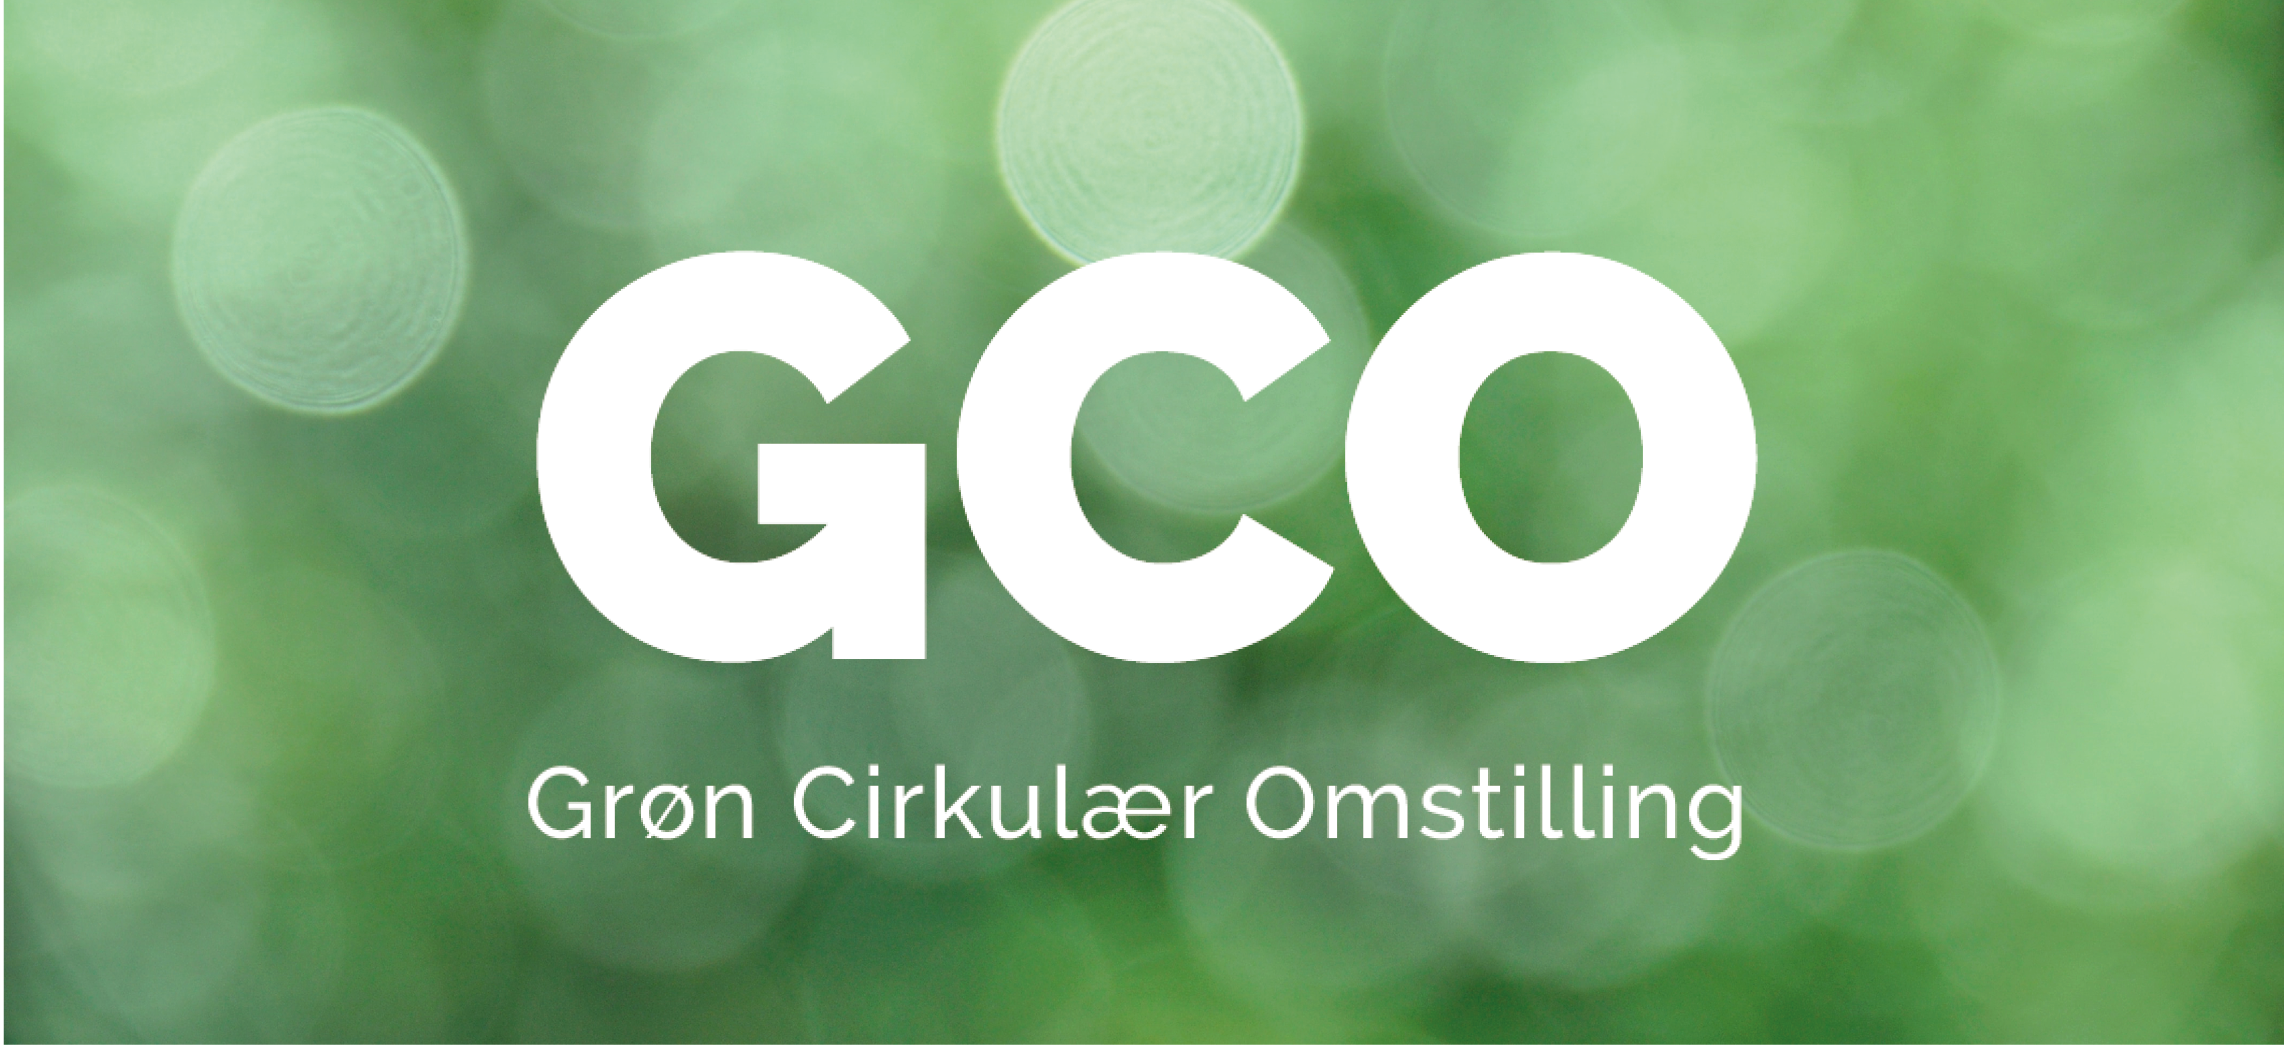 Bliv Konsulent I Danmarks Store Projekt Om Grønne, Cirkulære Forretningsmodeller Til SMV'er